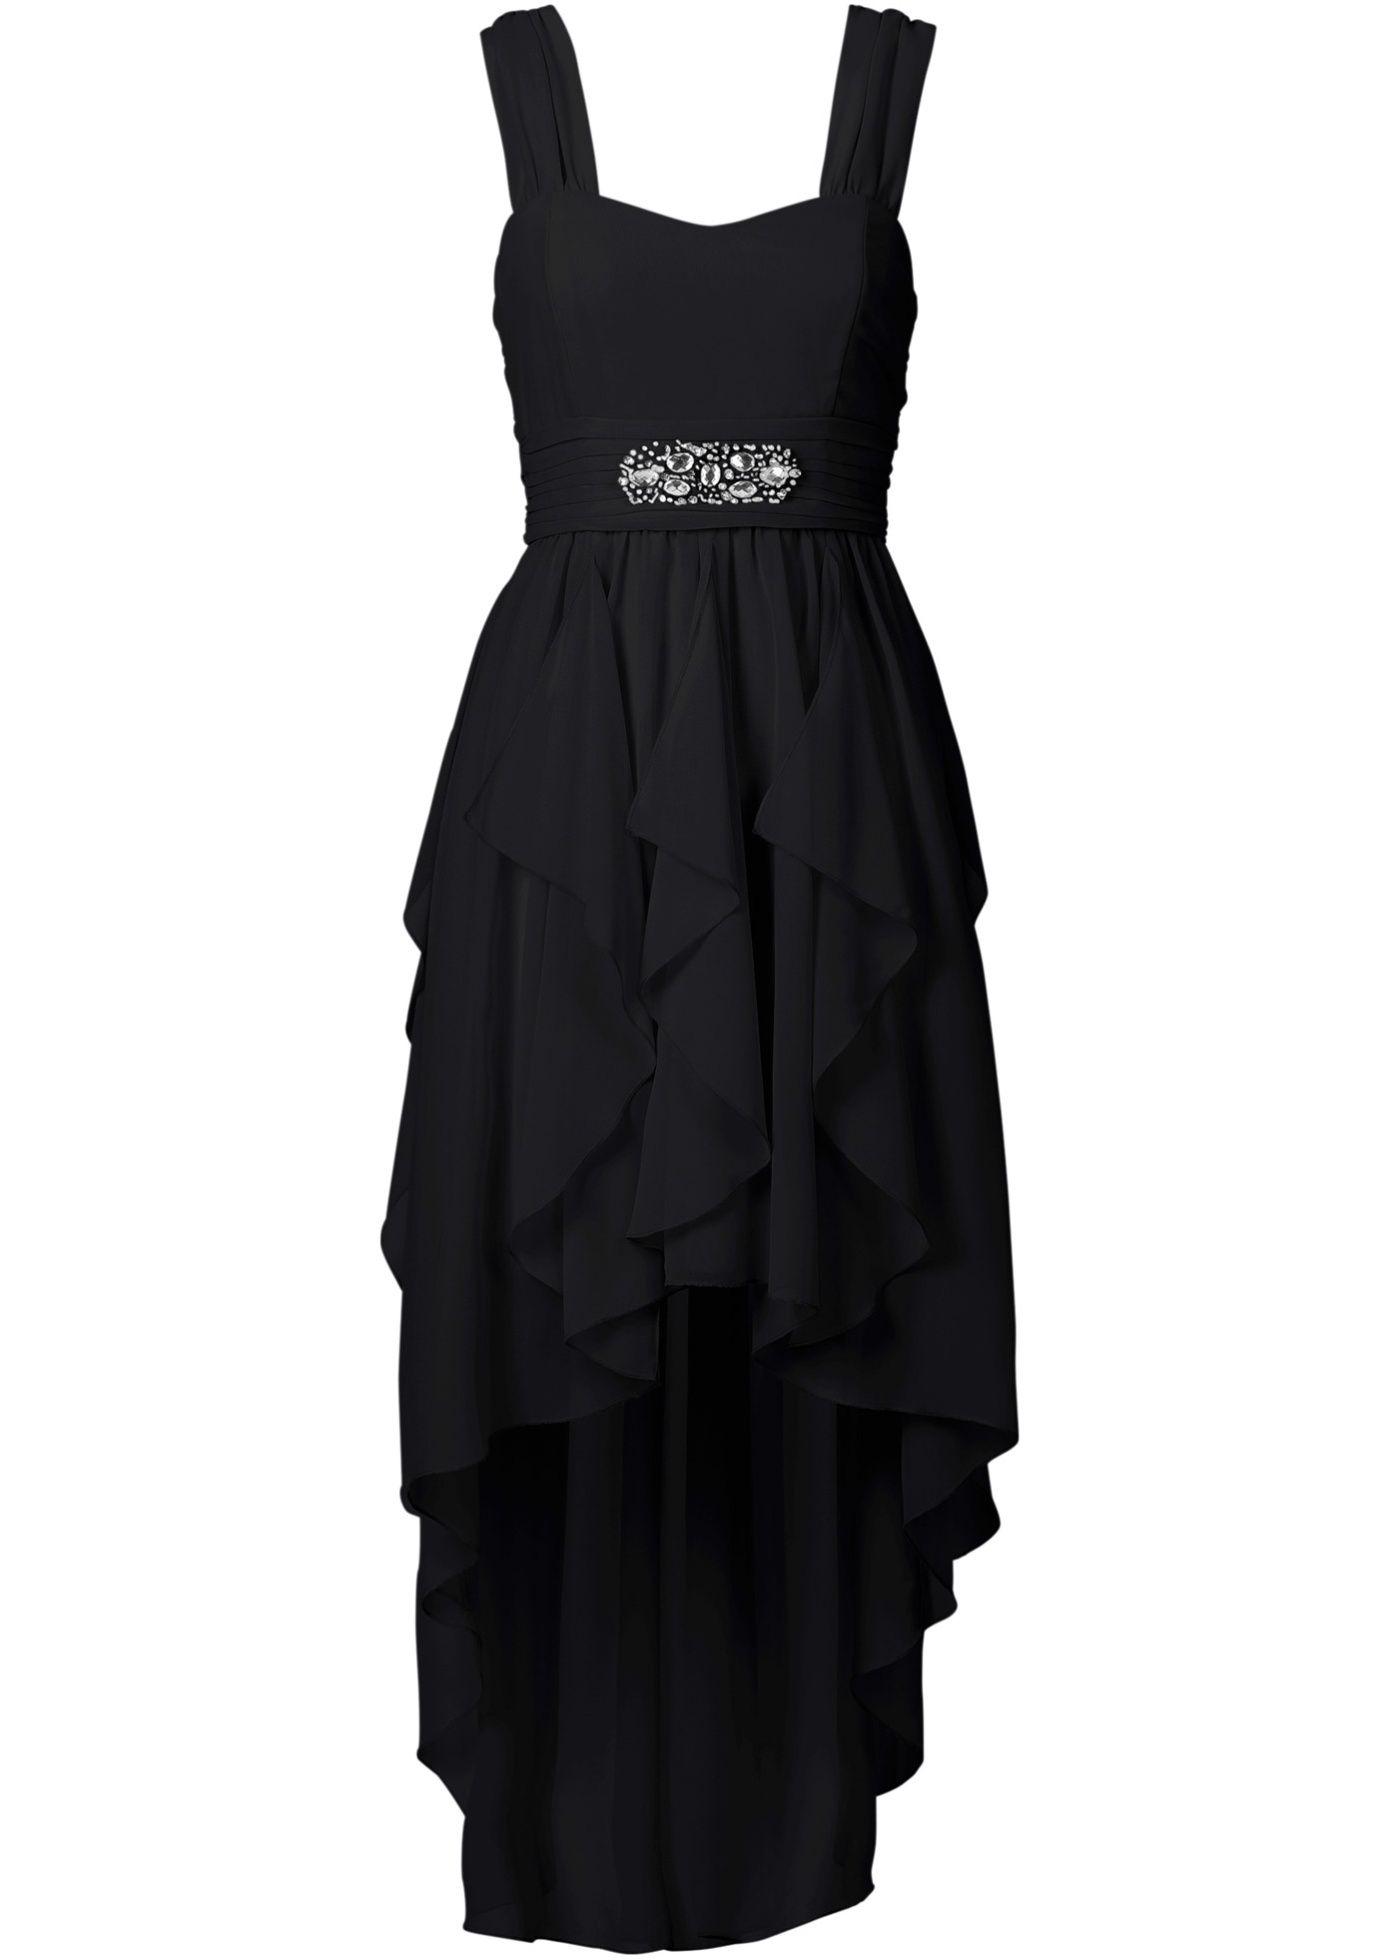 kleid, bodyflirt | vokuhila kleid, funkelndes kleid, kleider